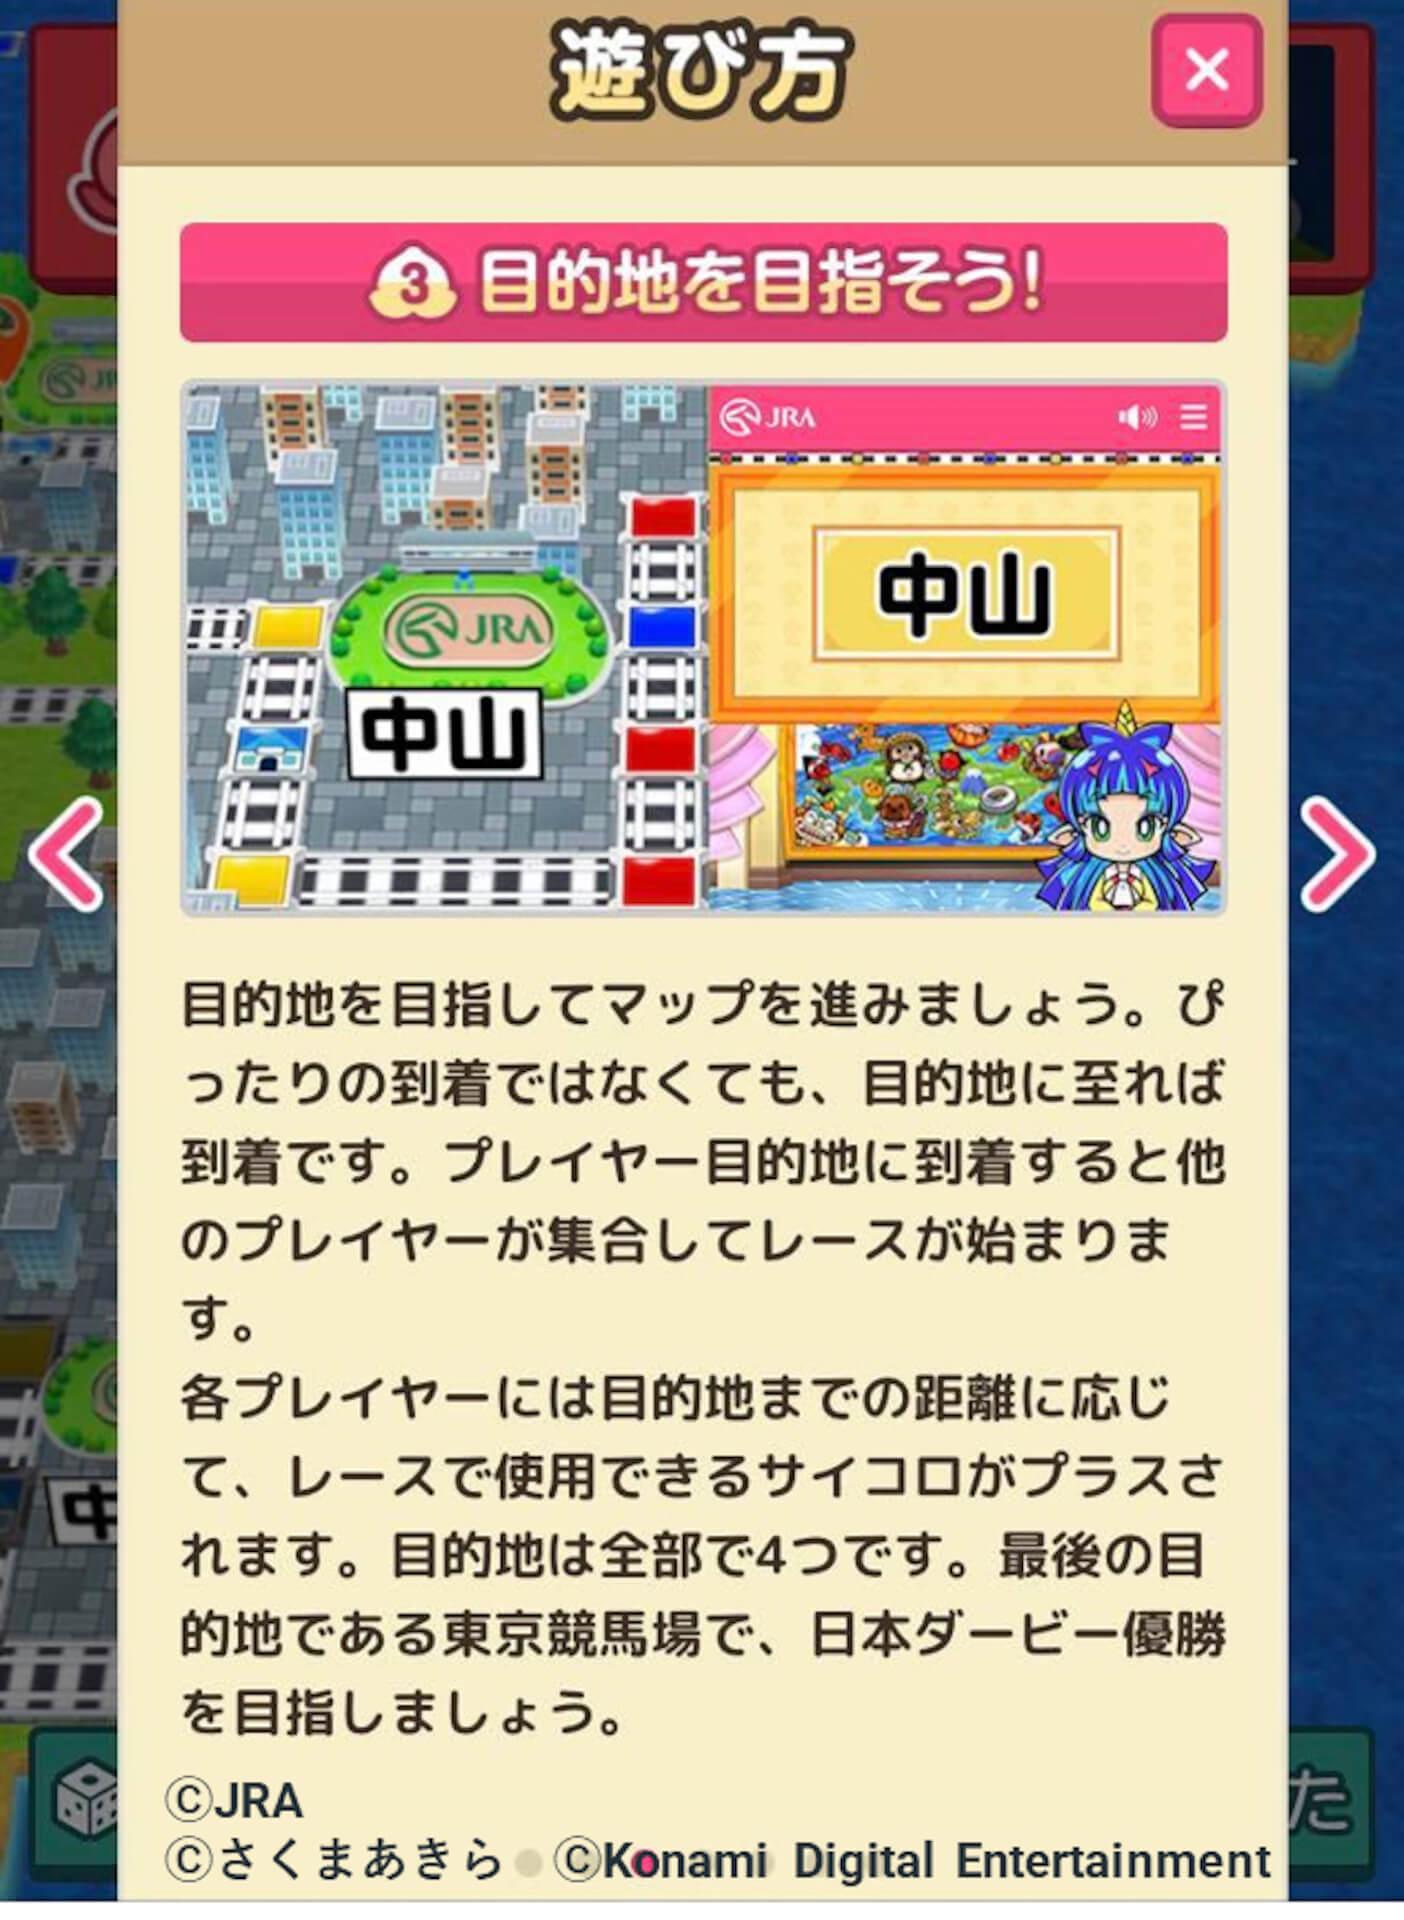 JRAと桃太郎電鉄が日本ダービーでコラボ!1万円分の電子マネーギフトが当たるTwitterキャンペーンも実施 tech210517_jra-momotetsu-210517_6